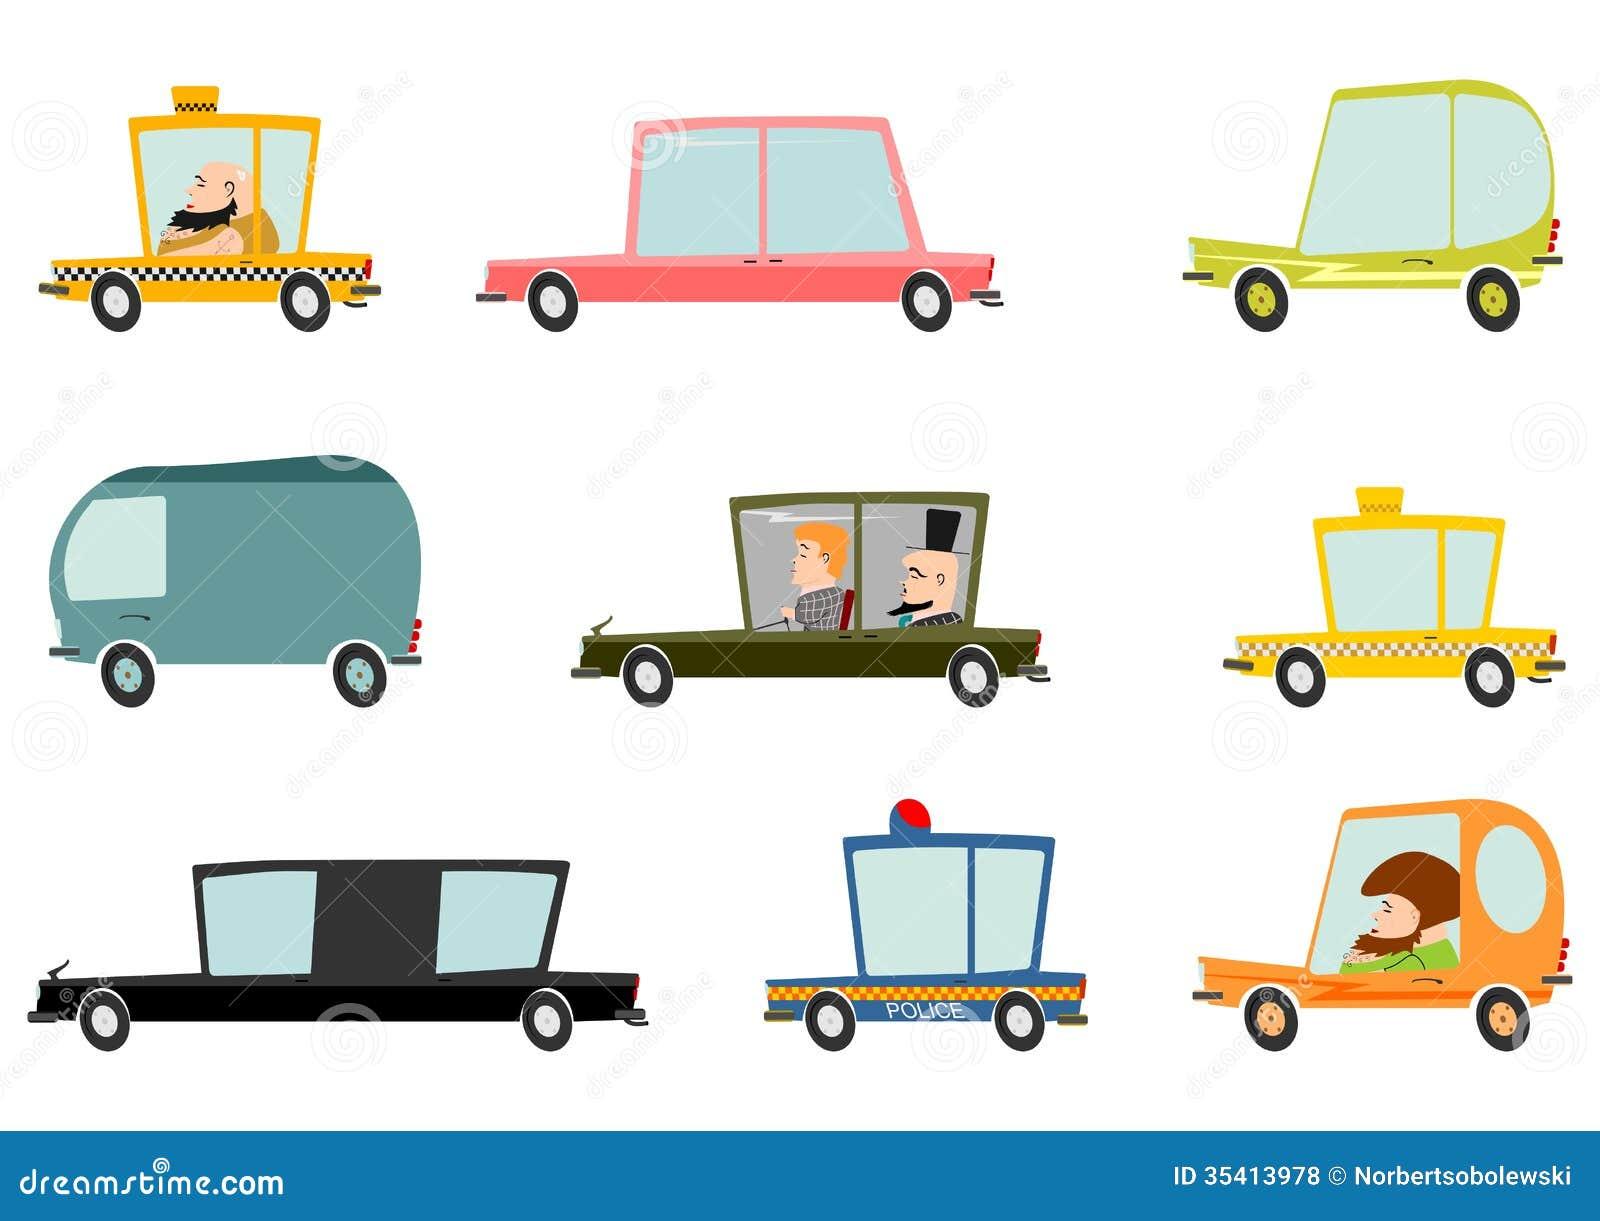 Cartoon car set stock vector. Illustration of compact - 35413978